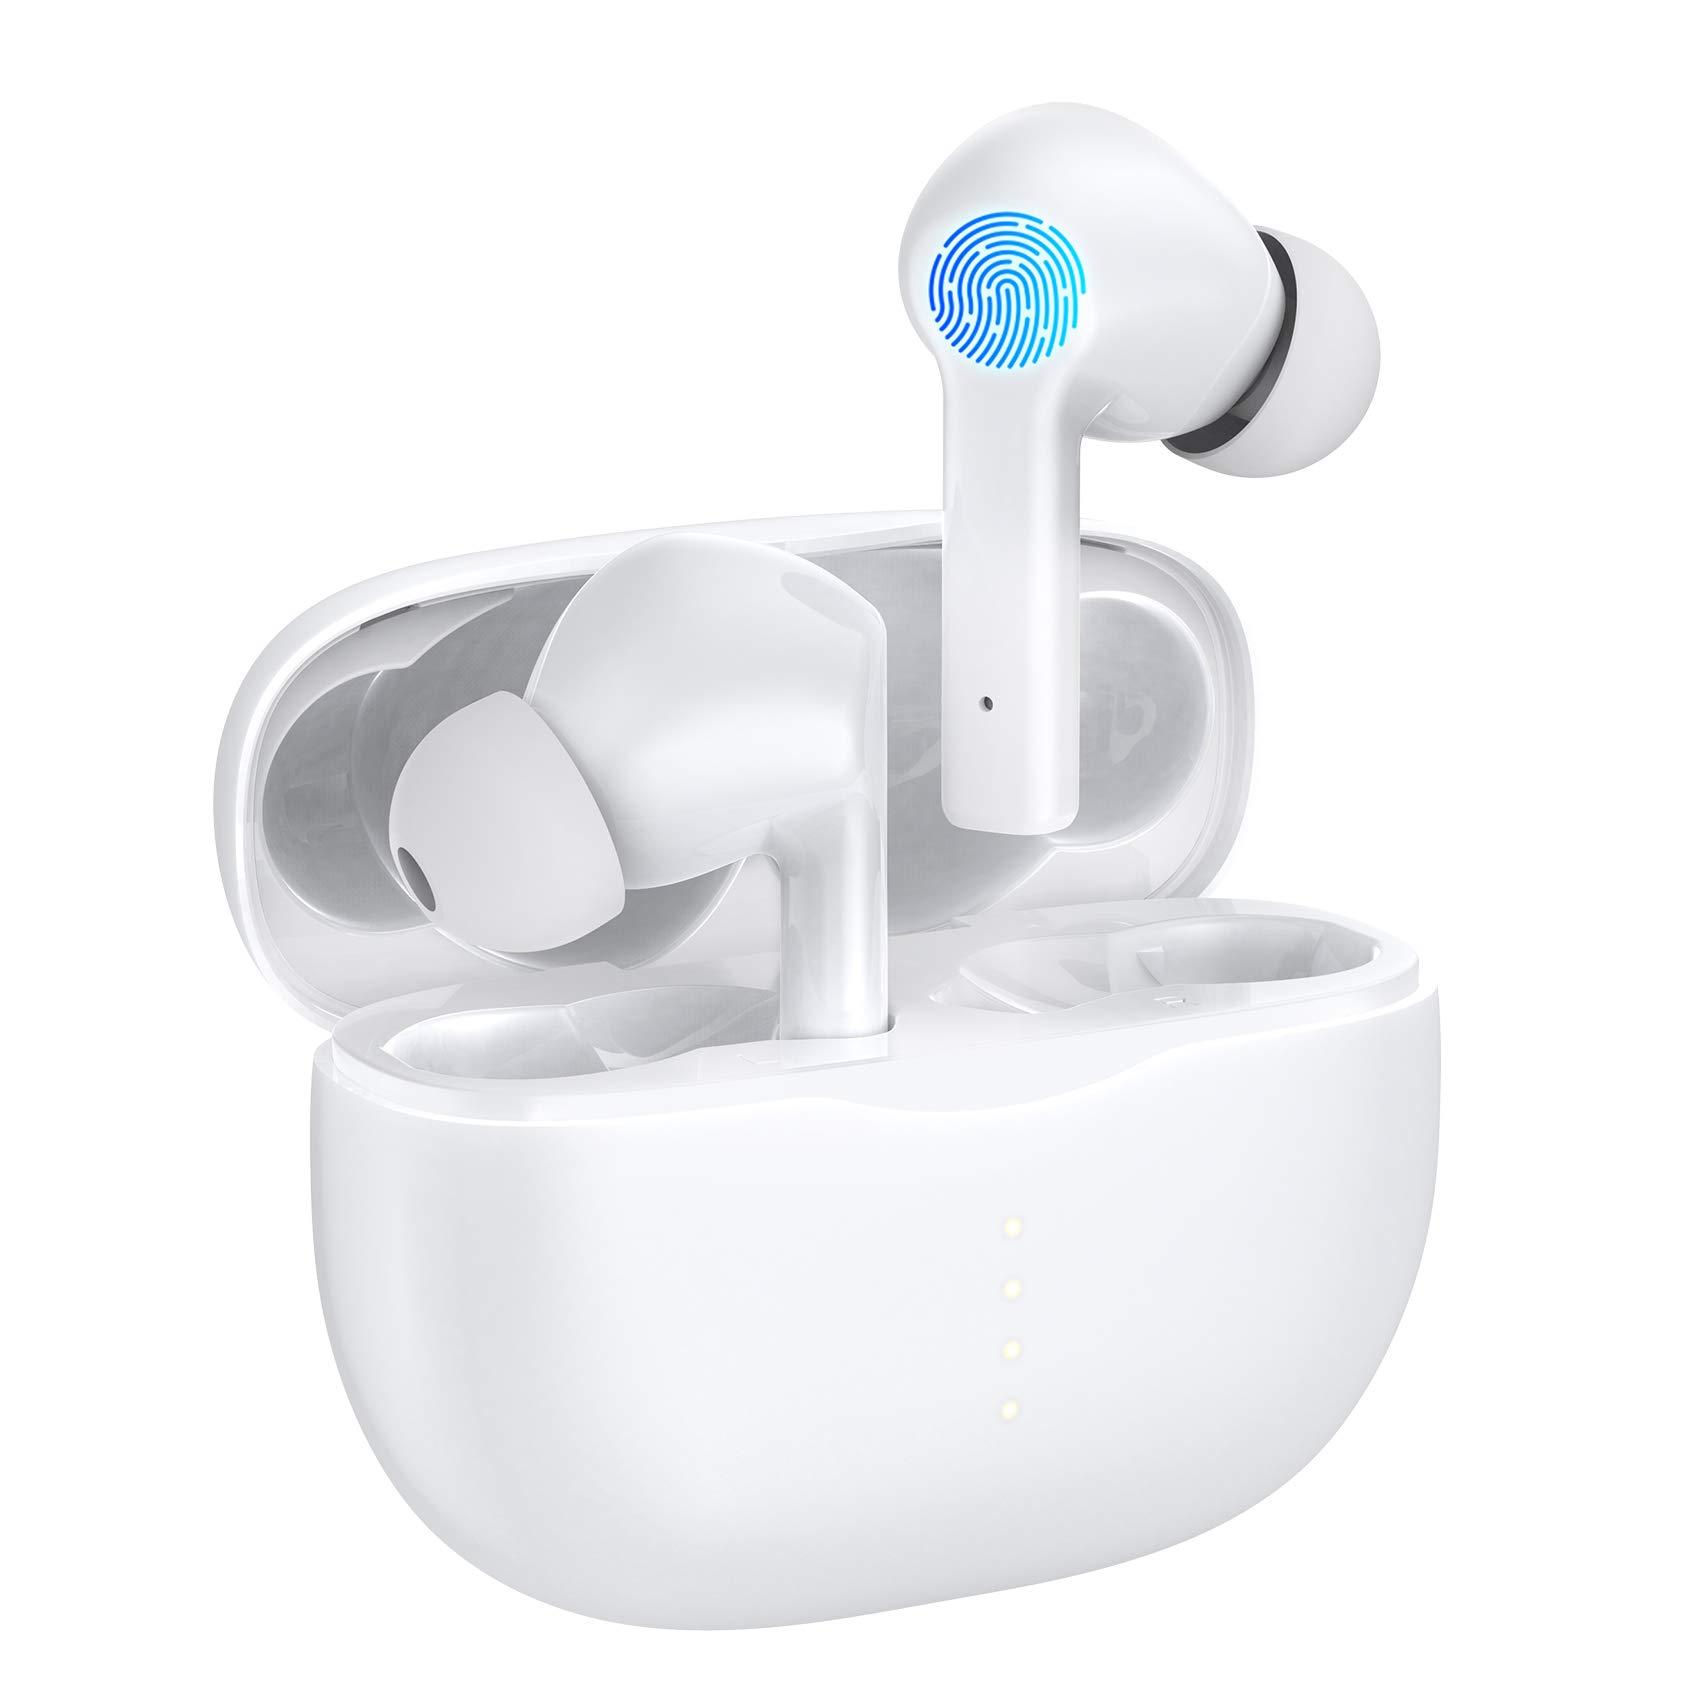 Auriculares Earbuds Inalambricos GAMURRY Waterproof